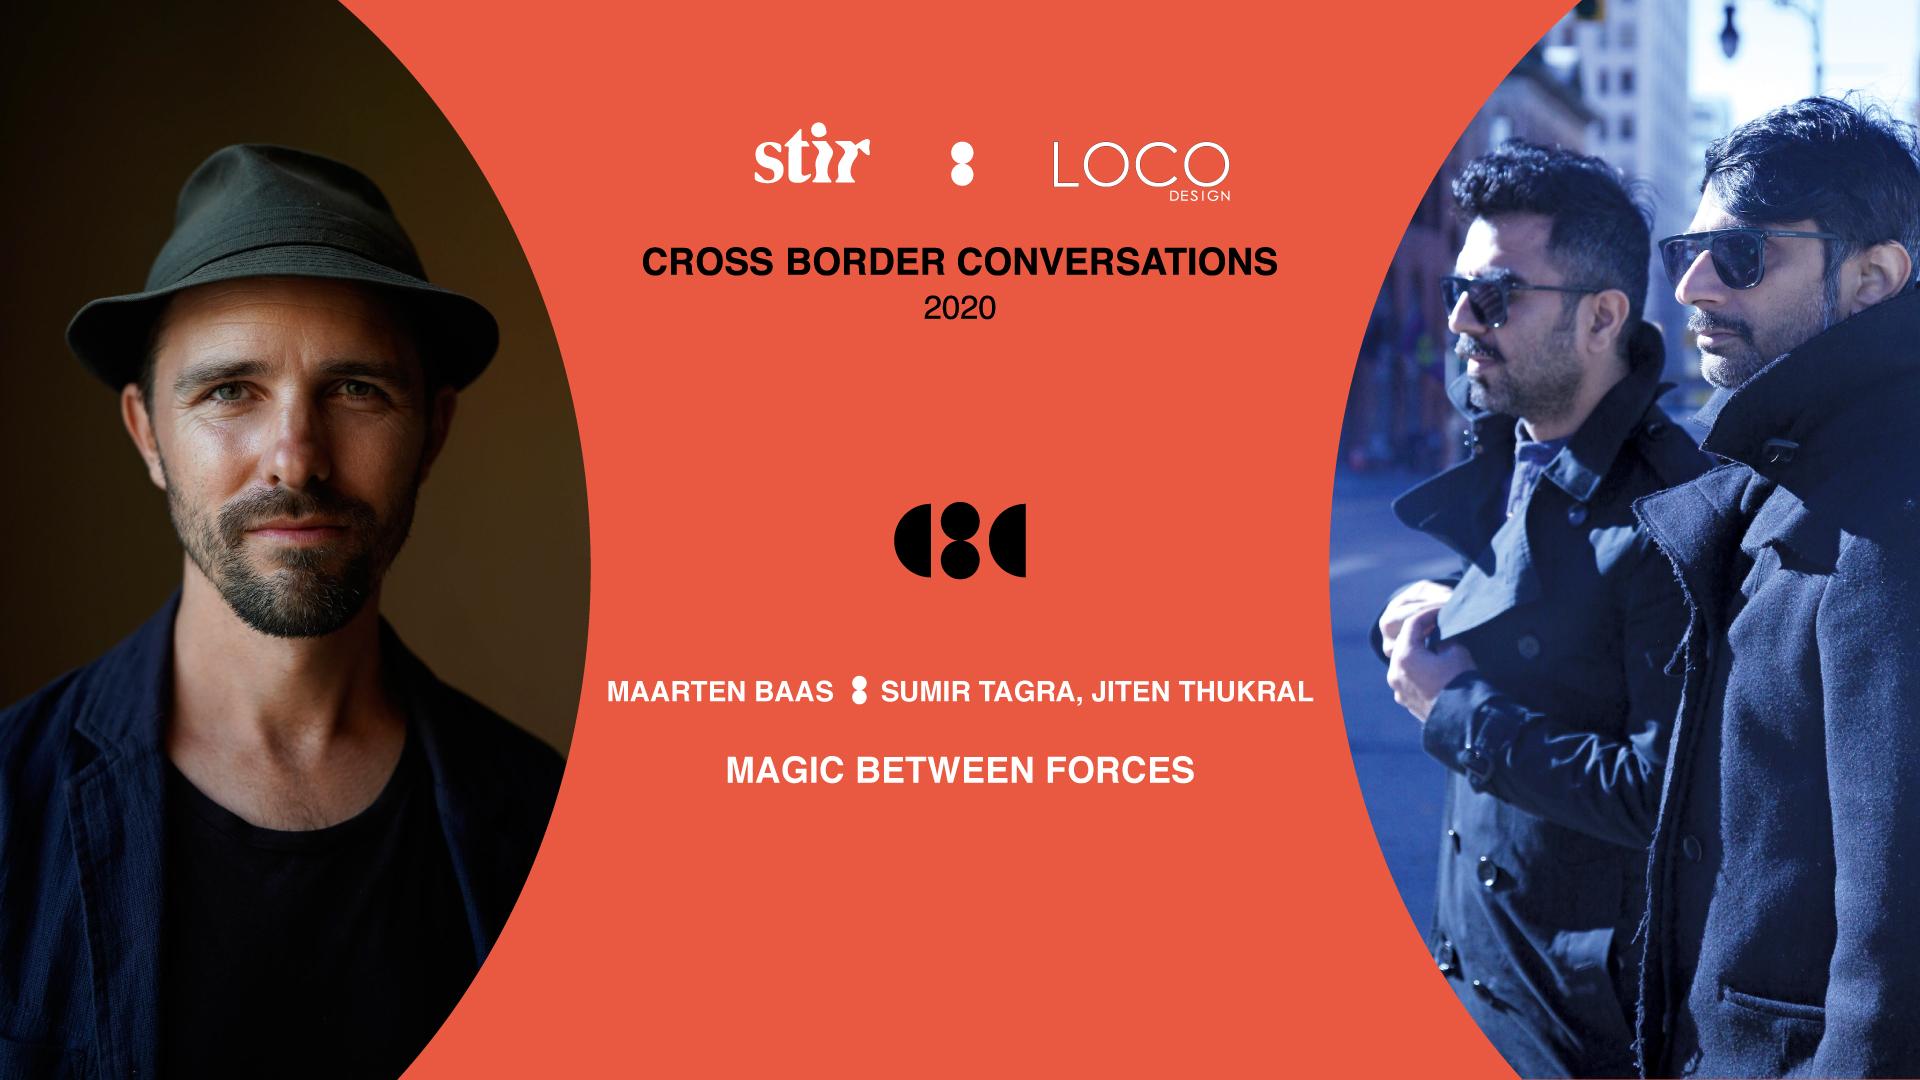 Cross Border Conversations | Maarten Baas X Thukral and Tagra | STIR X LOCO Design